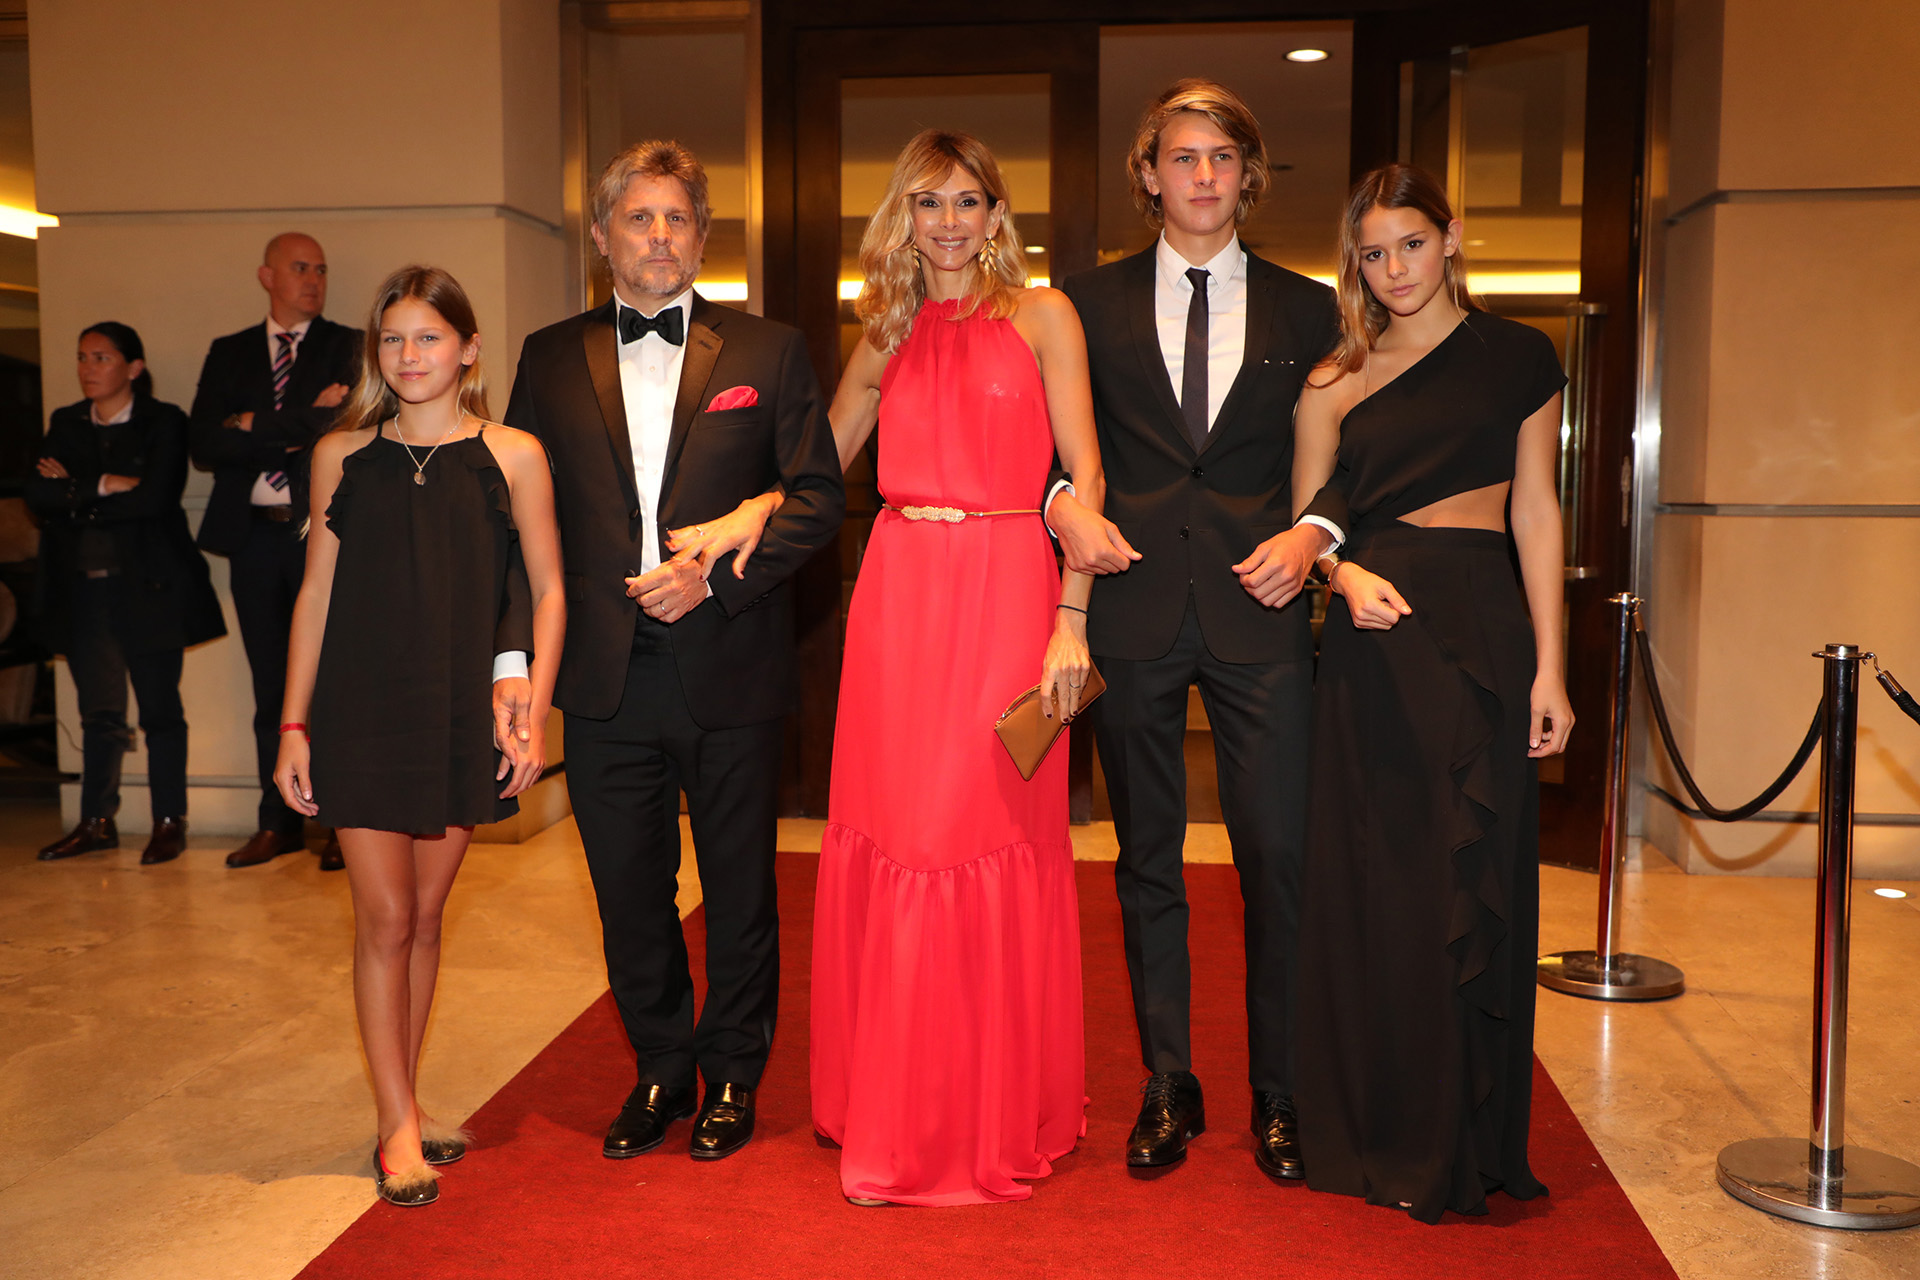 Vicky Fariña y Papo Roca en familia